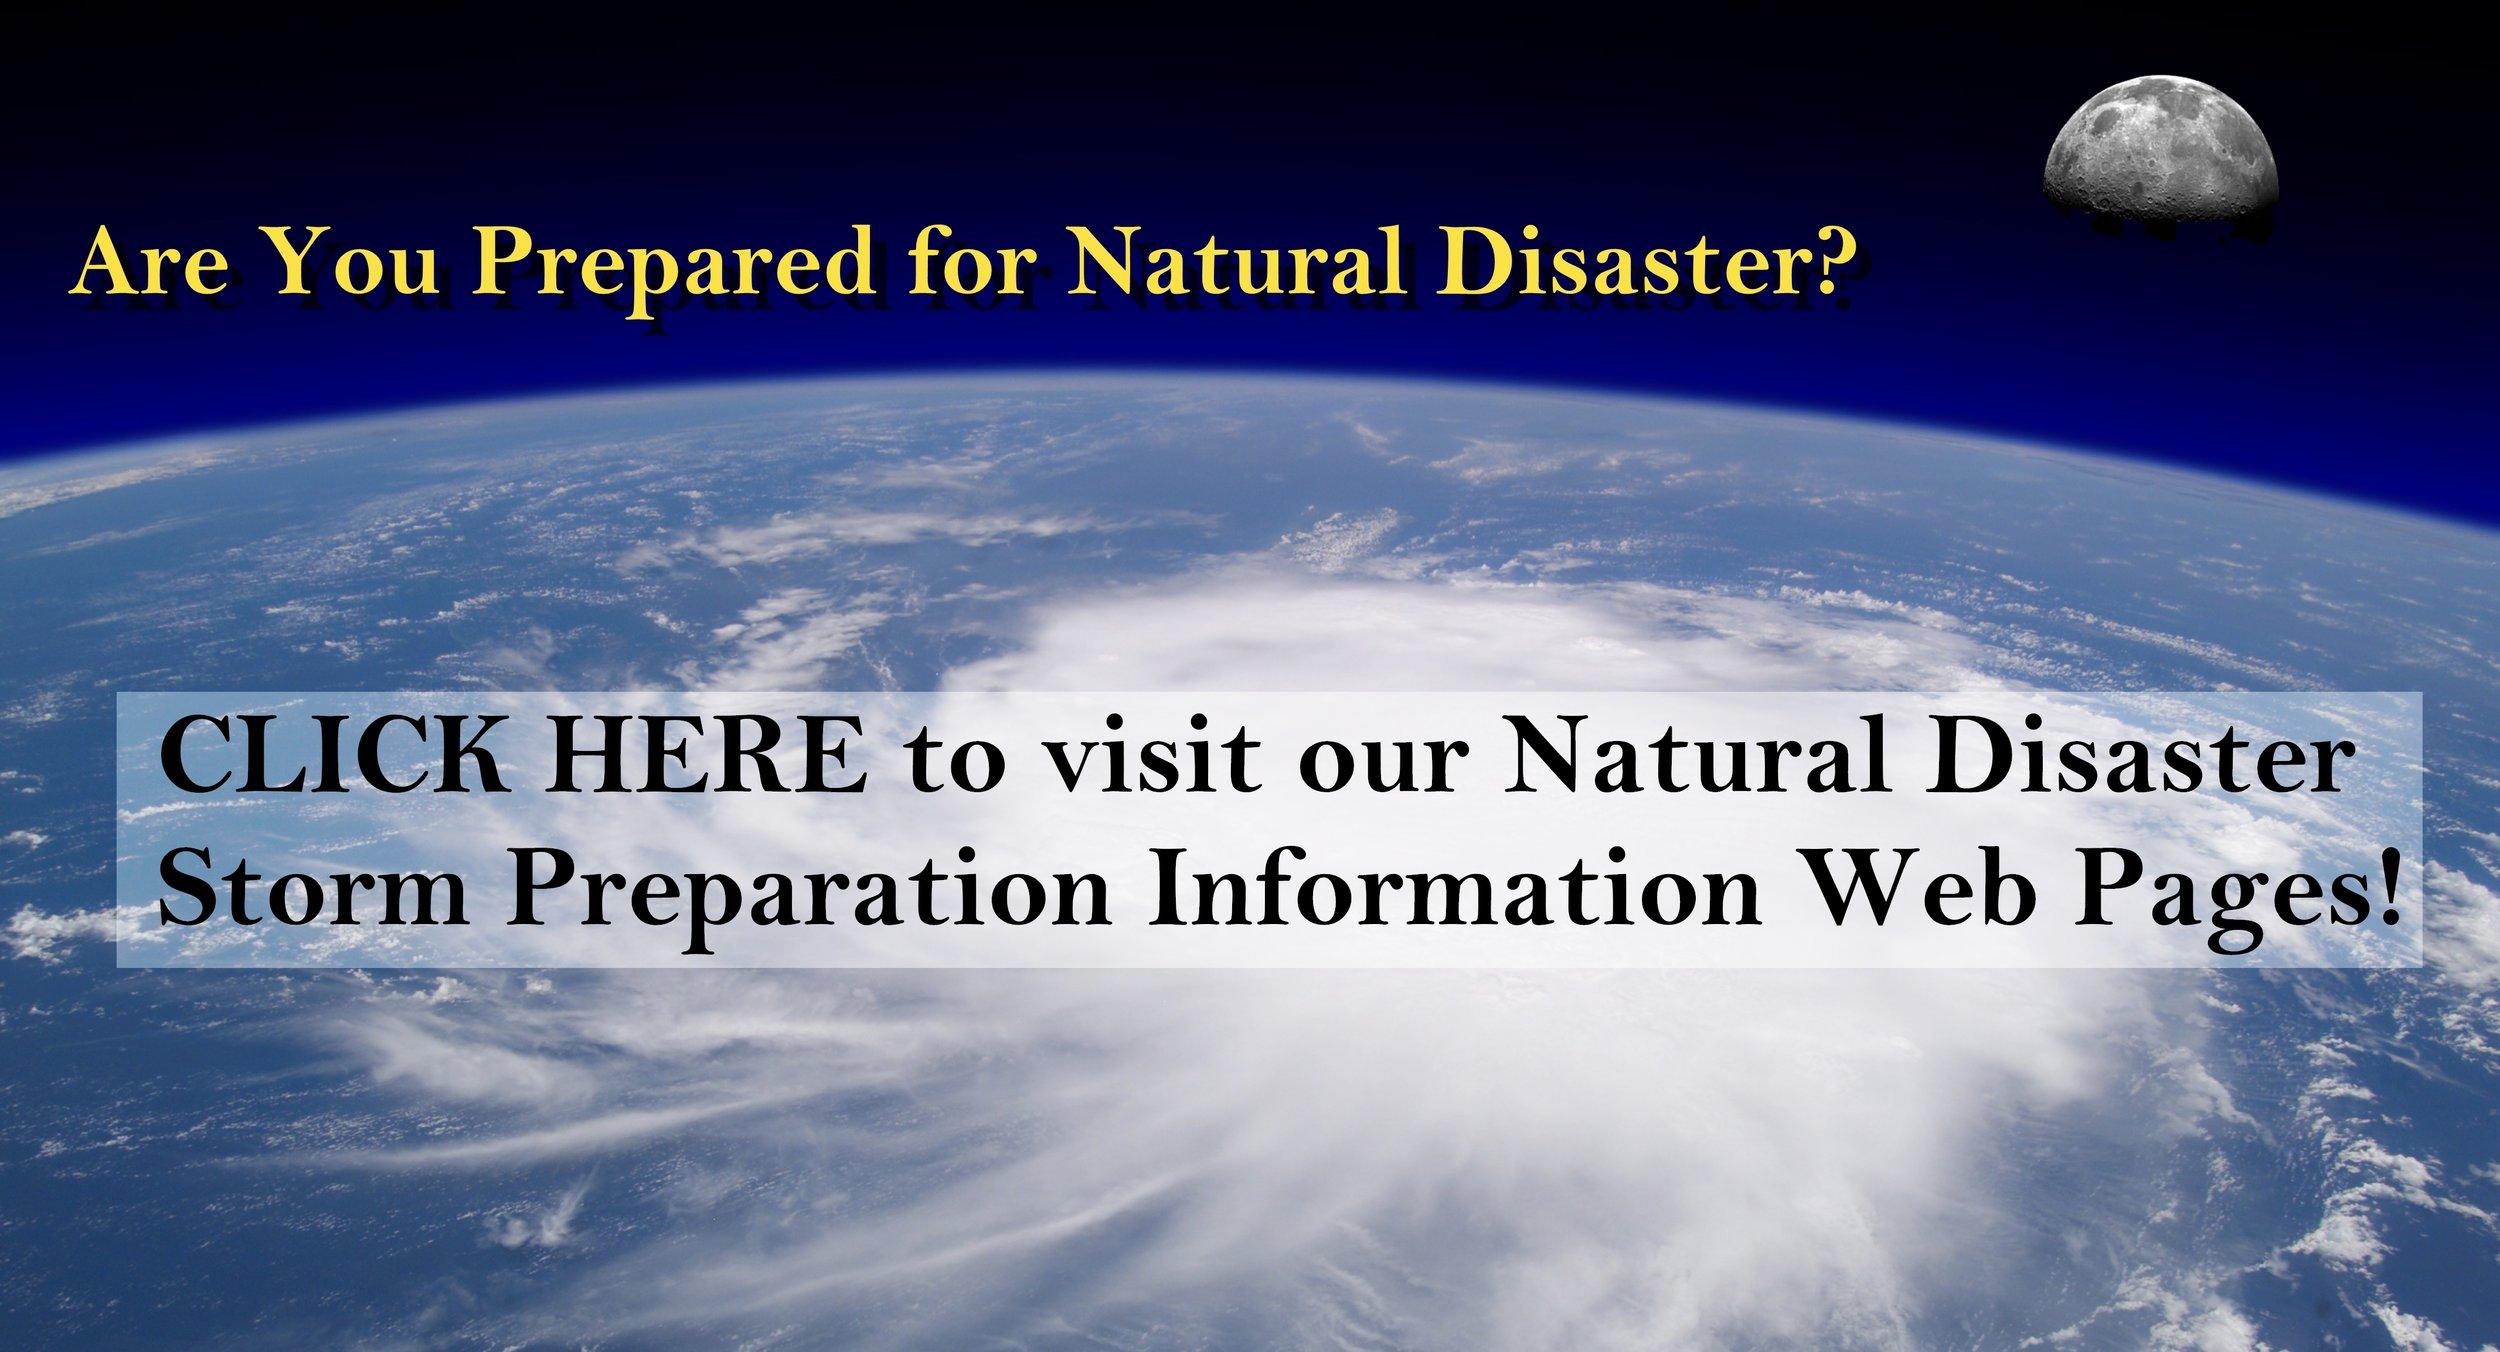 Storm Preparation Page image.jpg